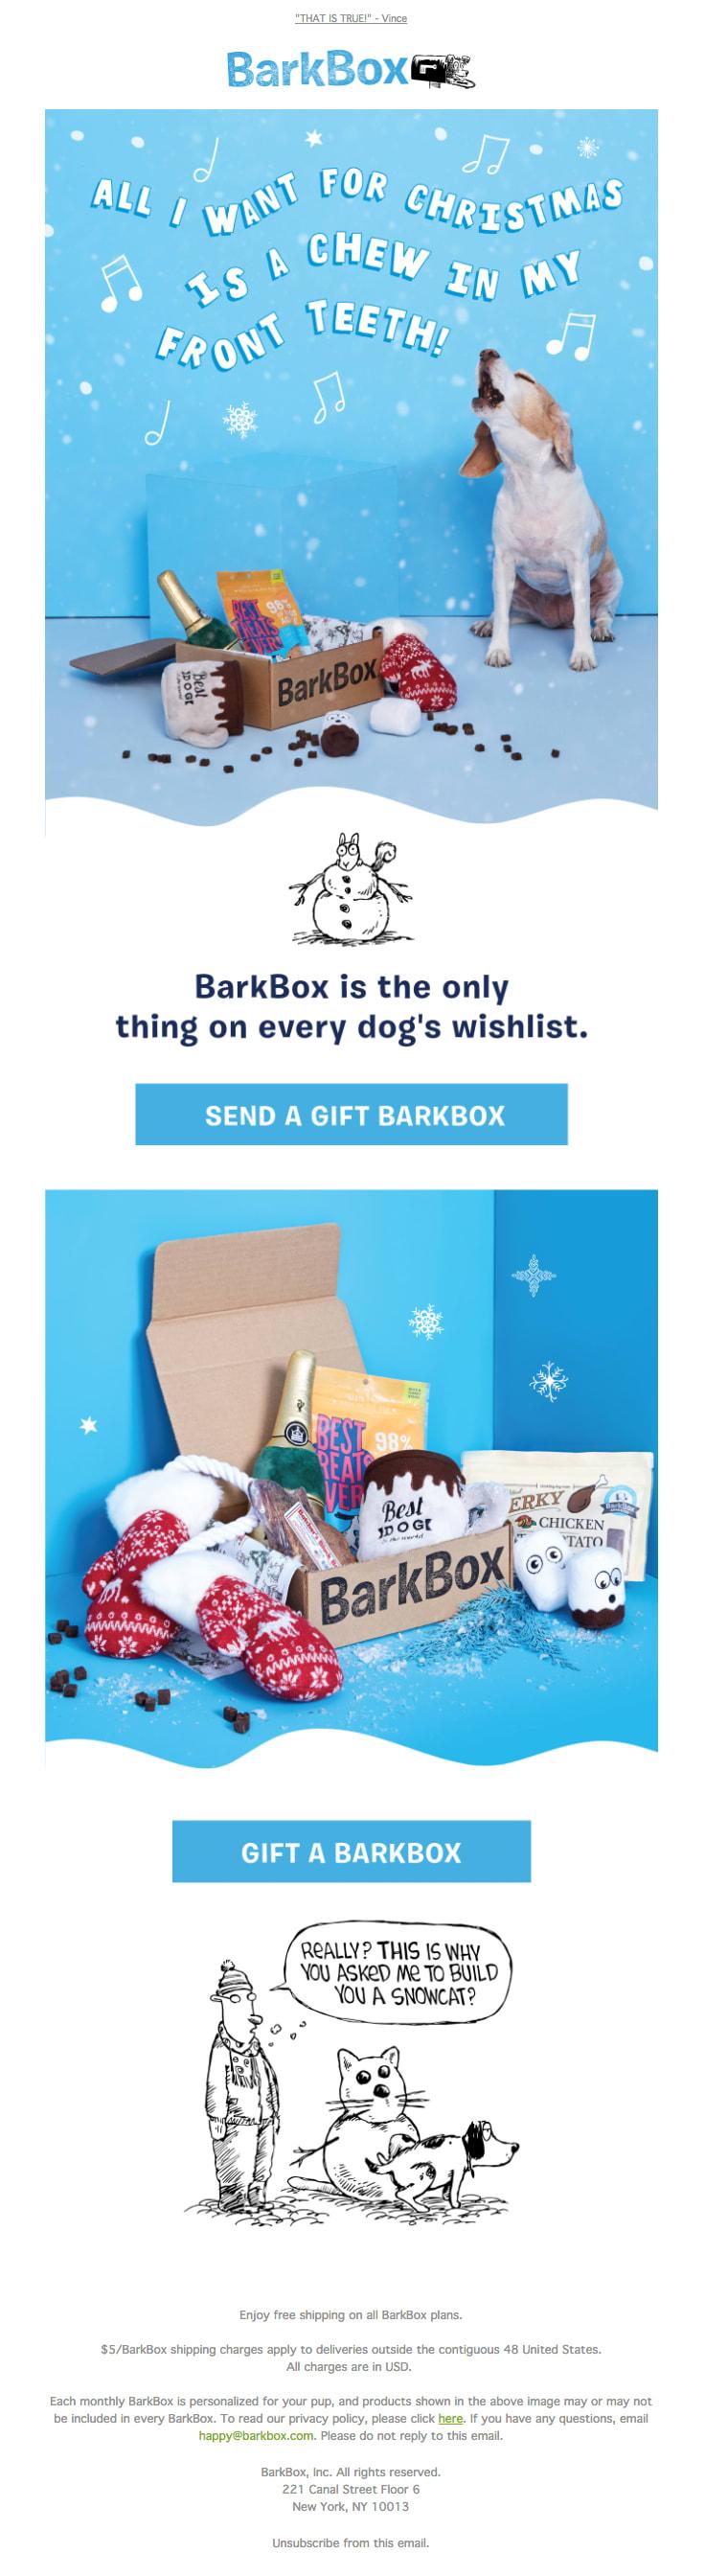 barkbox email marketing